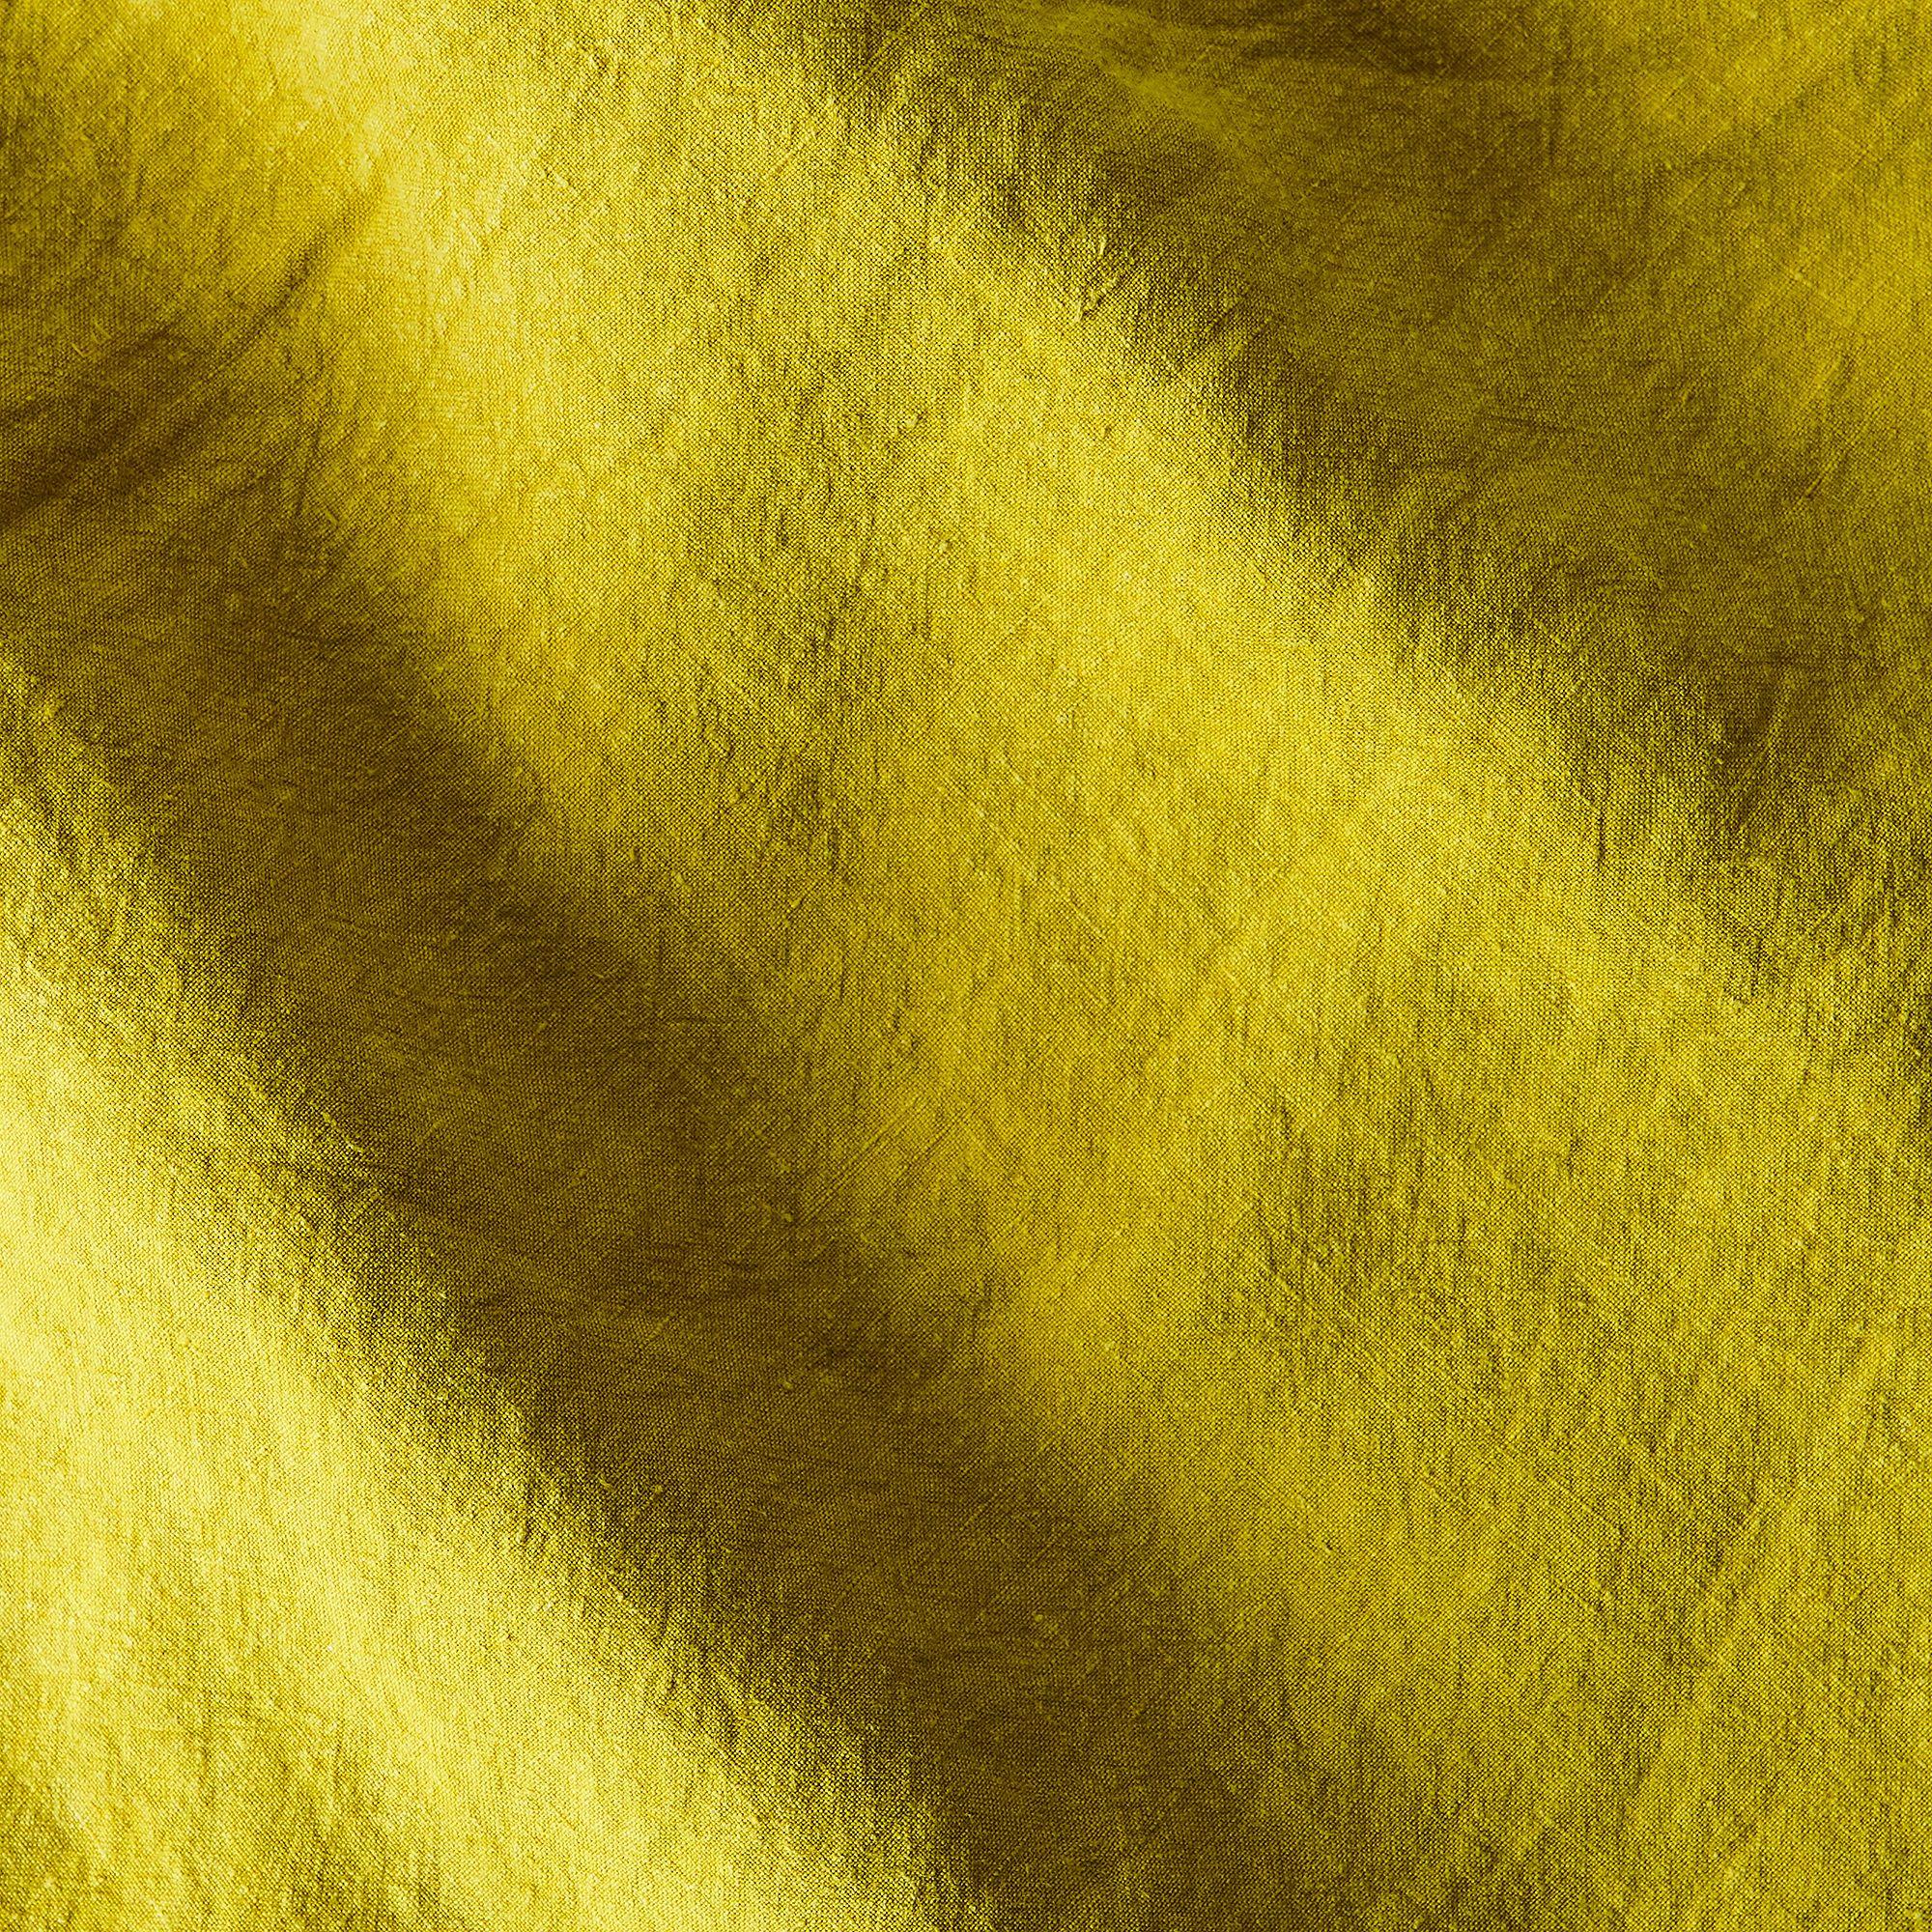 69458028 79eb 4d14 a8a2 a3321b80455a  2016 1106 hawkins ny stonewashed linen pillow mustard detail silo rocky luten 166